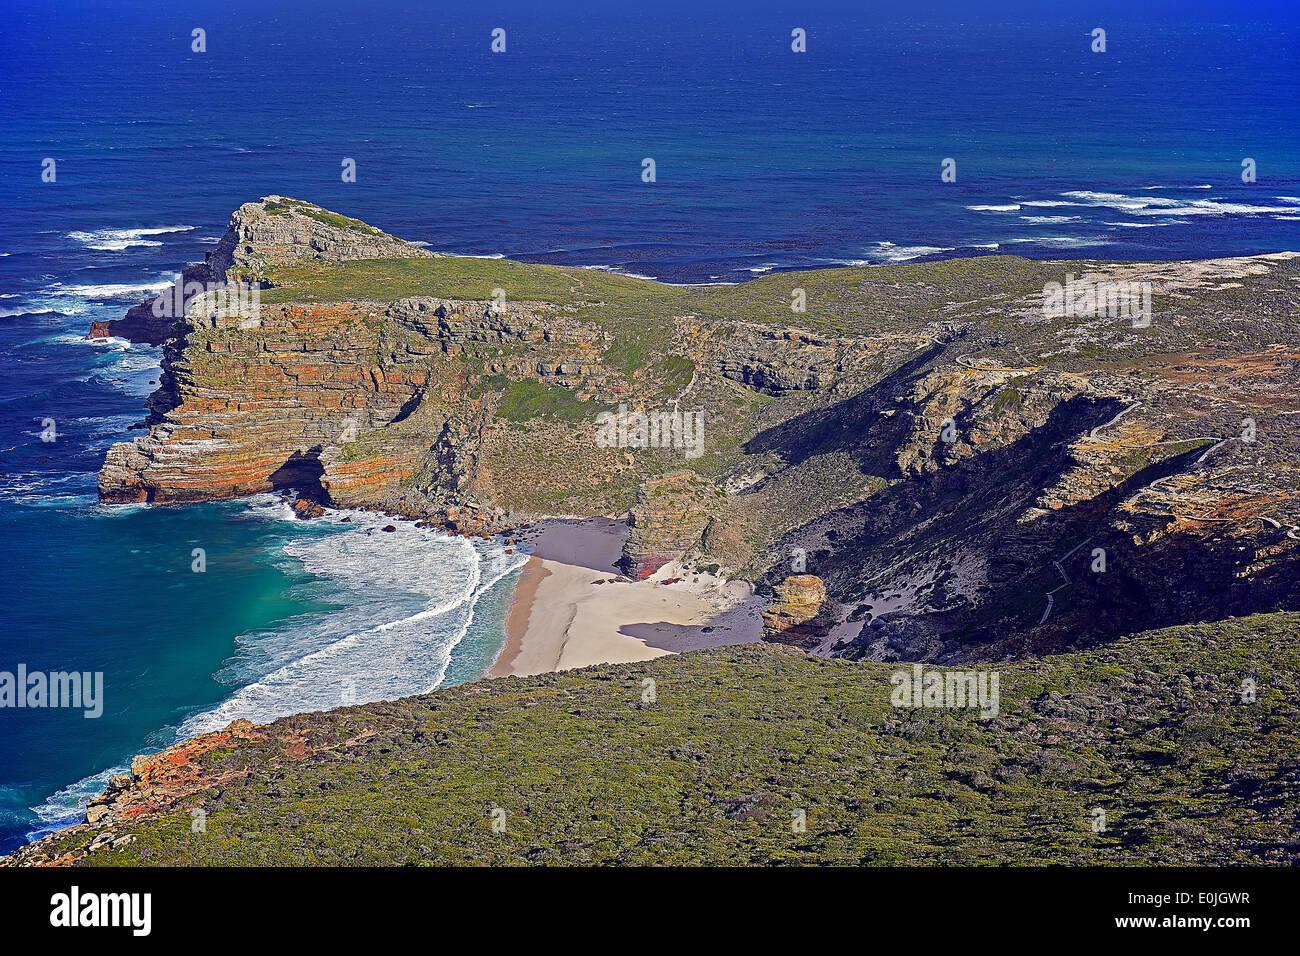 Kap der guten Hoffnung, Cape of good Hope, West Kap, western Cape, Suedafrika, Afrika - Stock Image